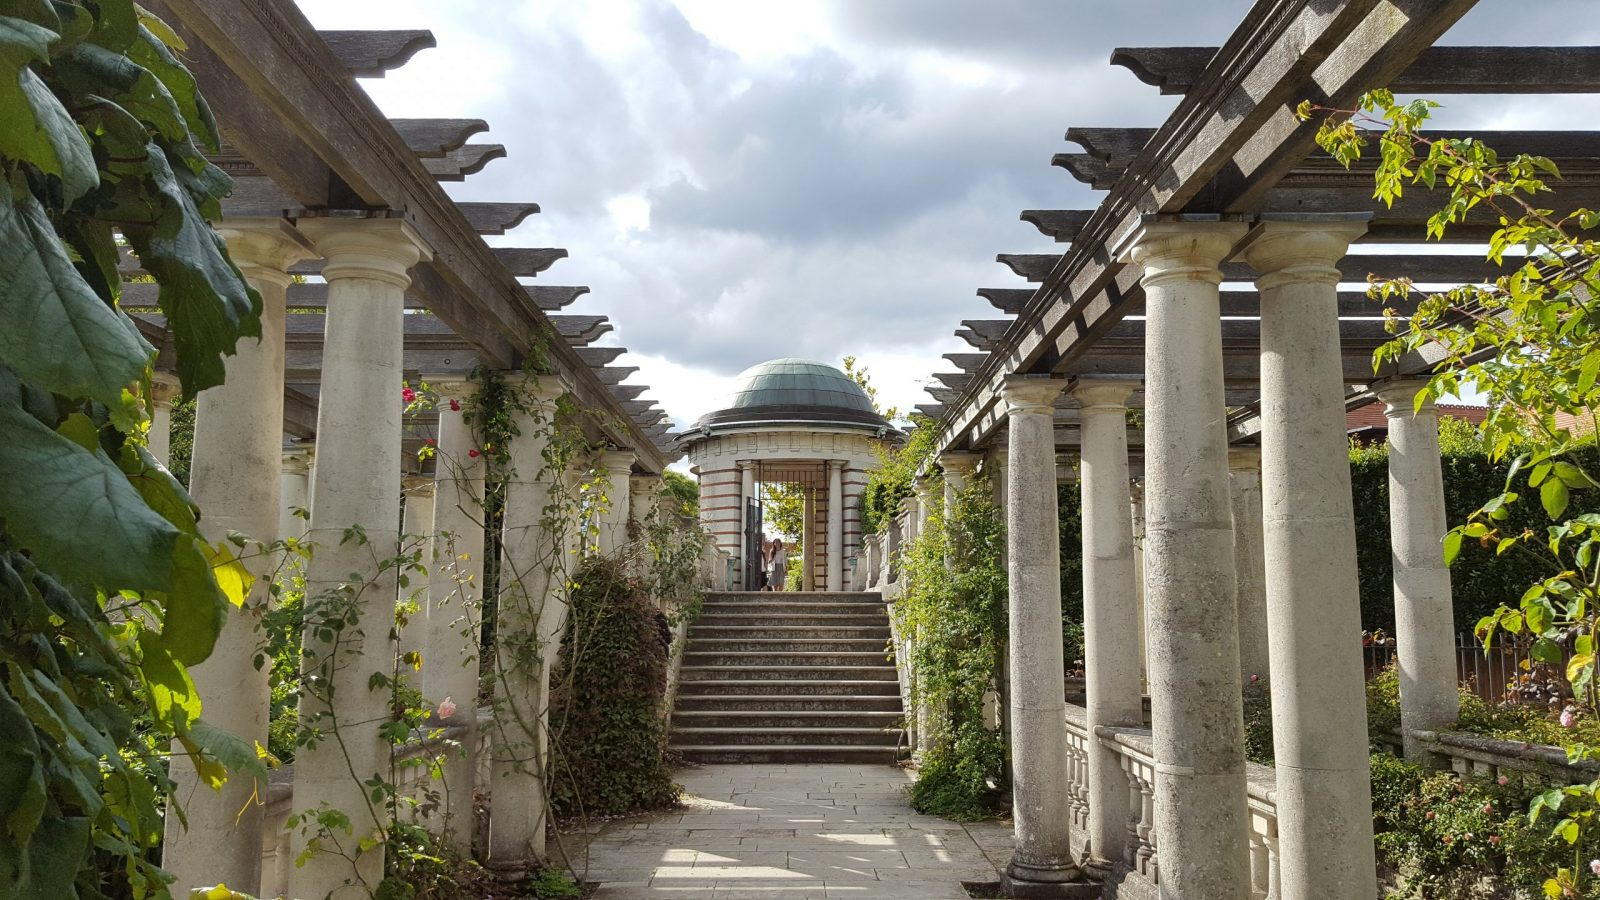 Visiting Hill Garden & Pergola, Hampstead Heath: Photo Gallery 6